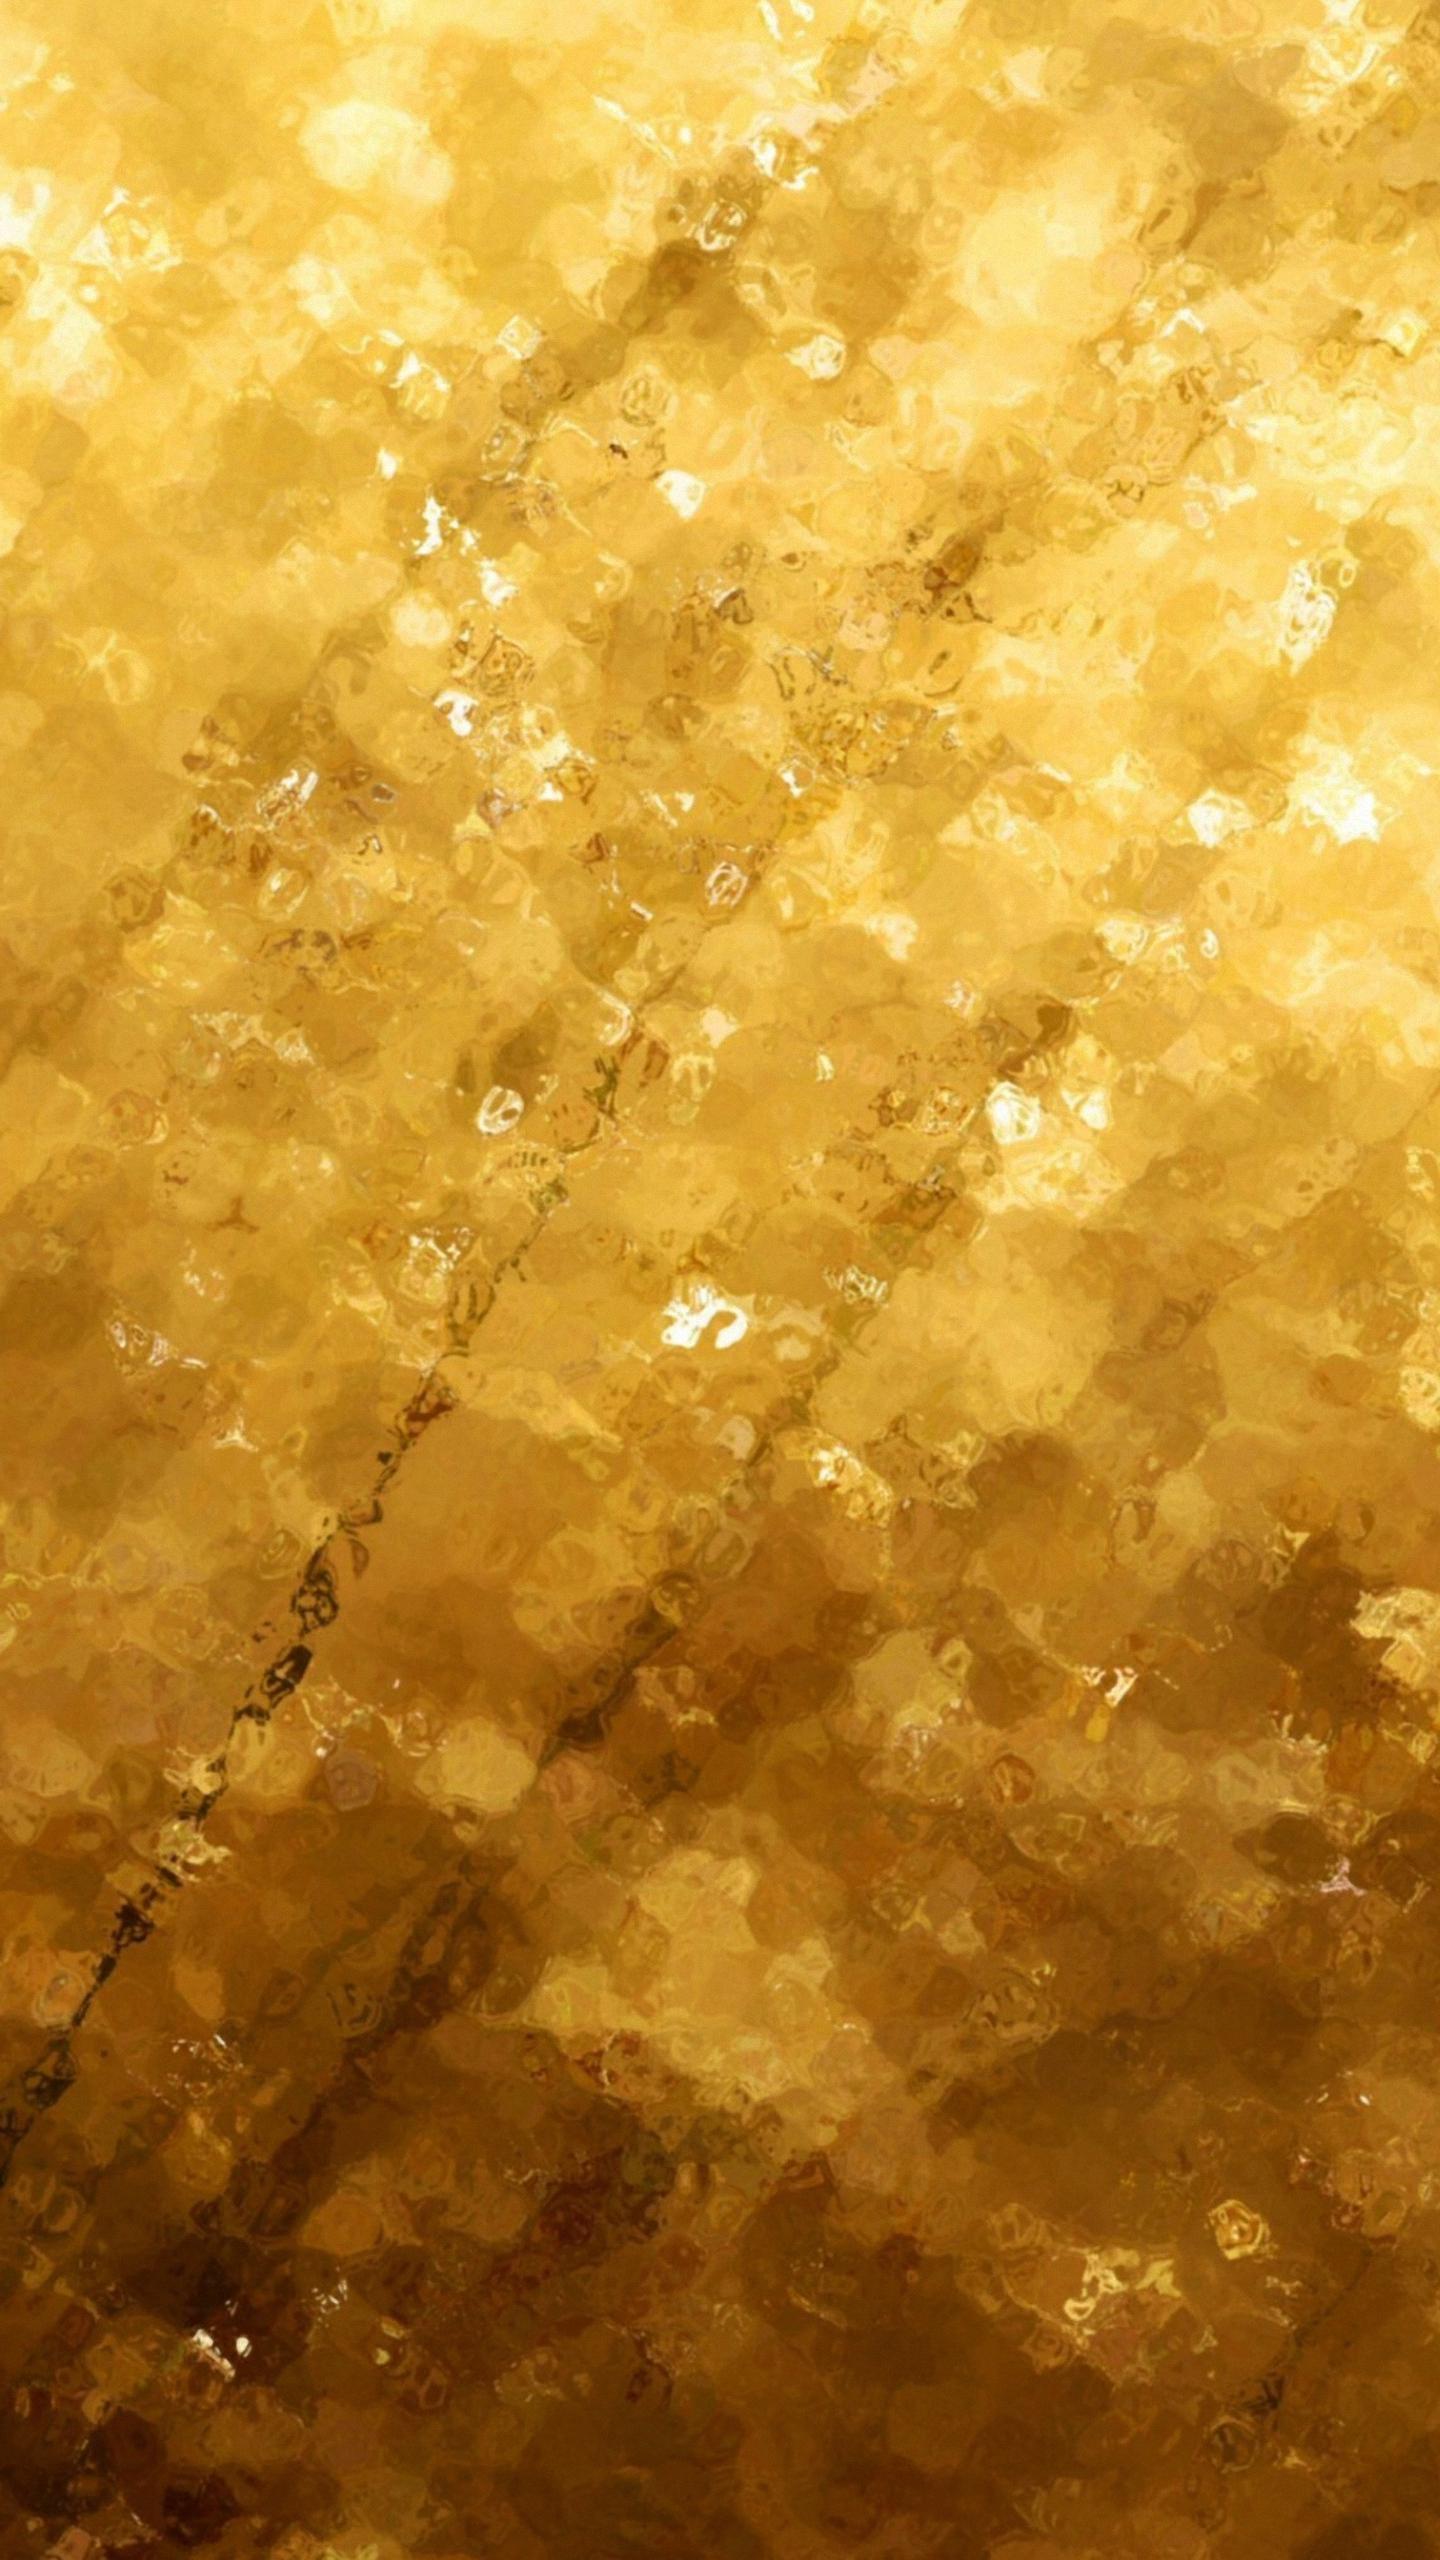 gold galaxy s6 wallpaper wallpapersafari. Black Bedroom Furniture Sets. Home Design Ideas